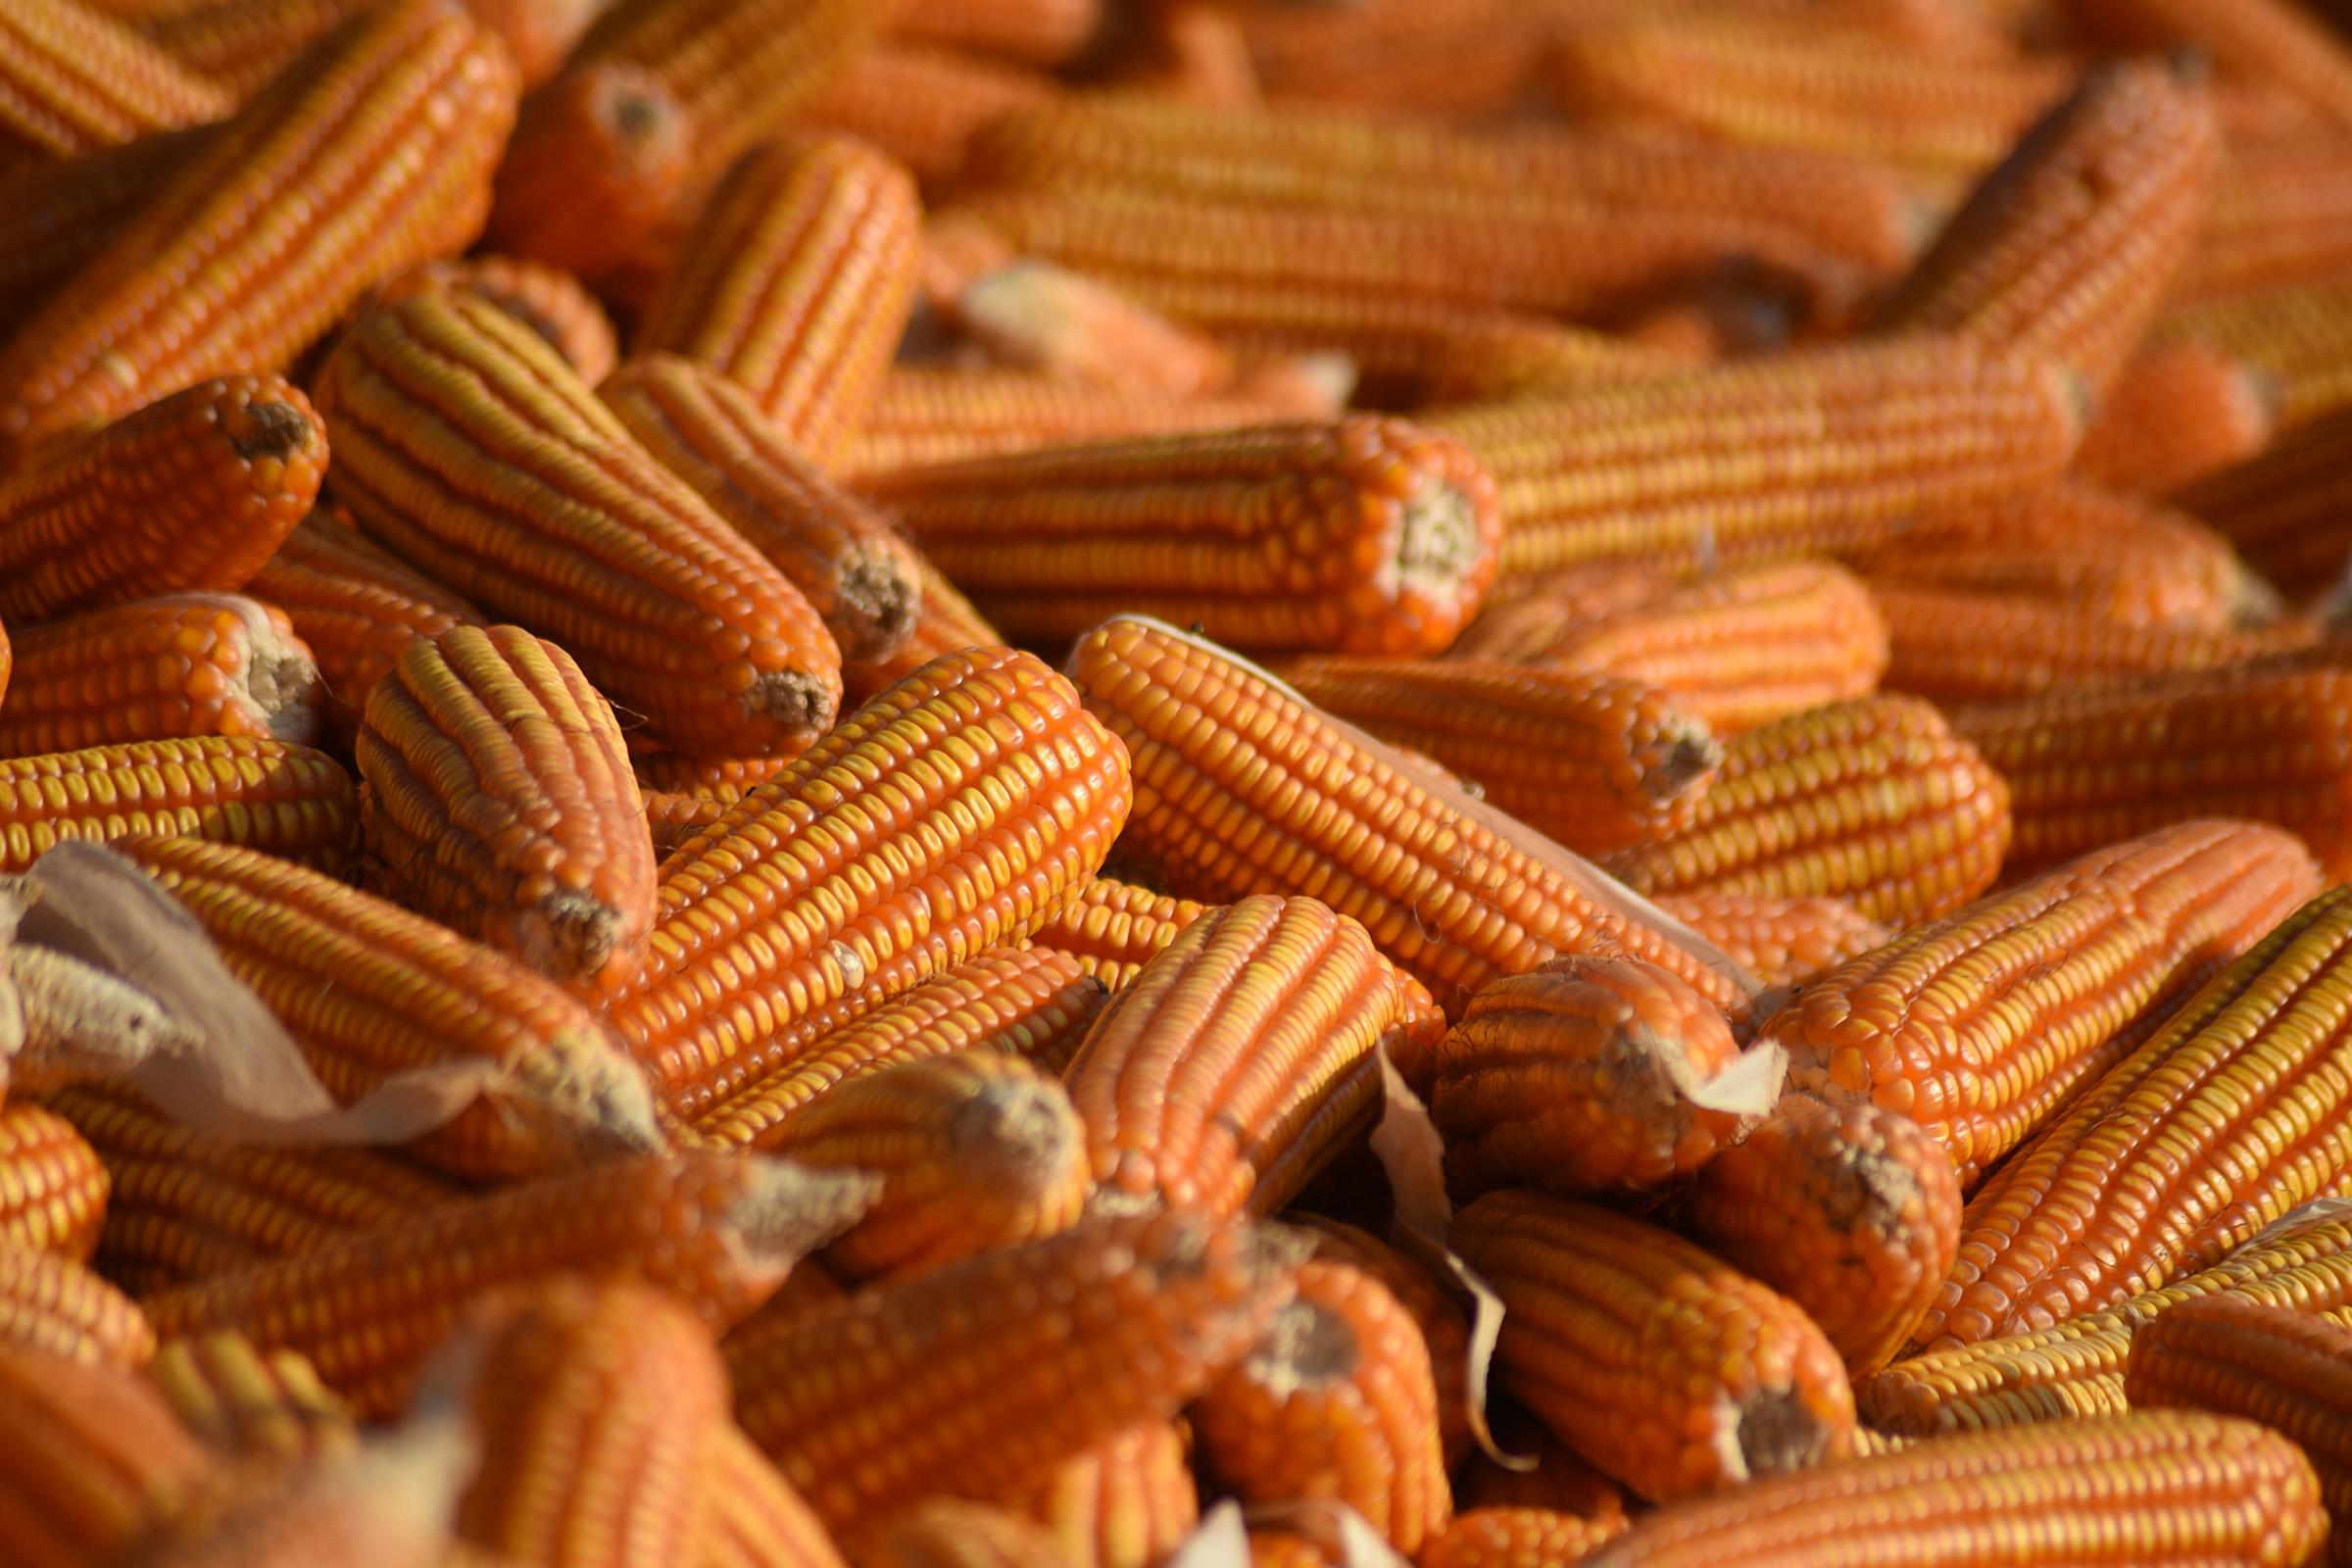 Harvested corns